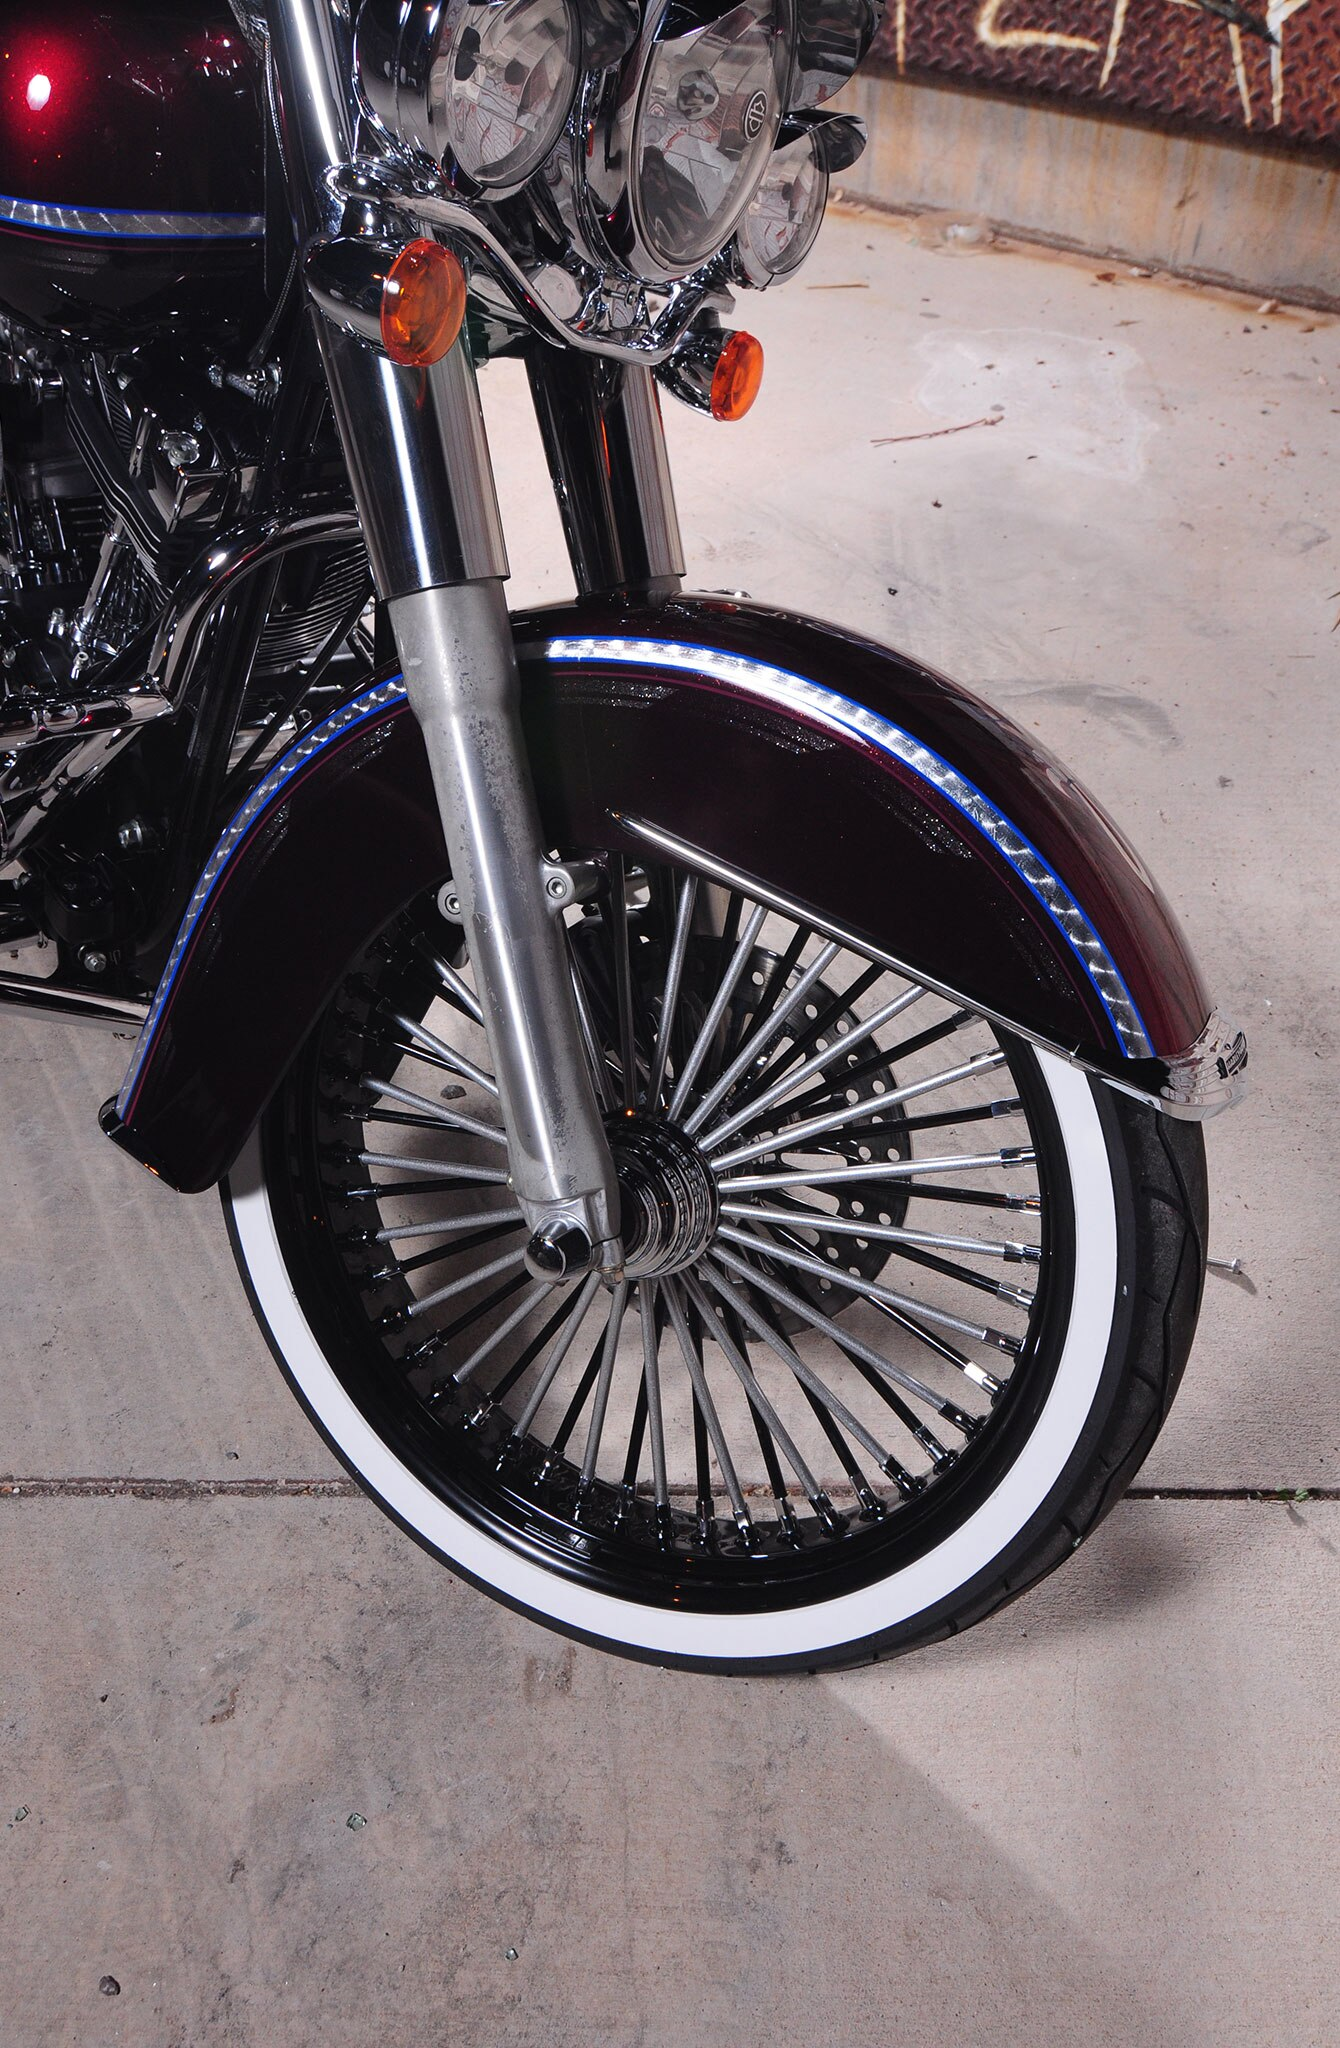 2005 Harley Davidson Softail Un Dia La Vez